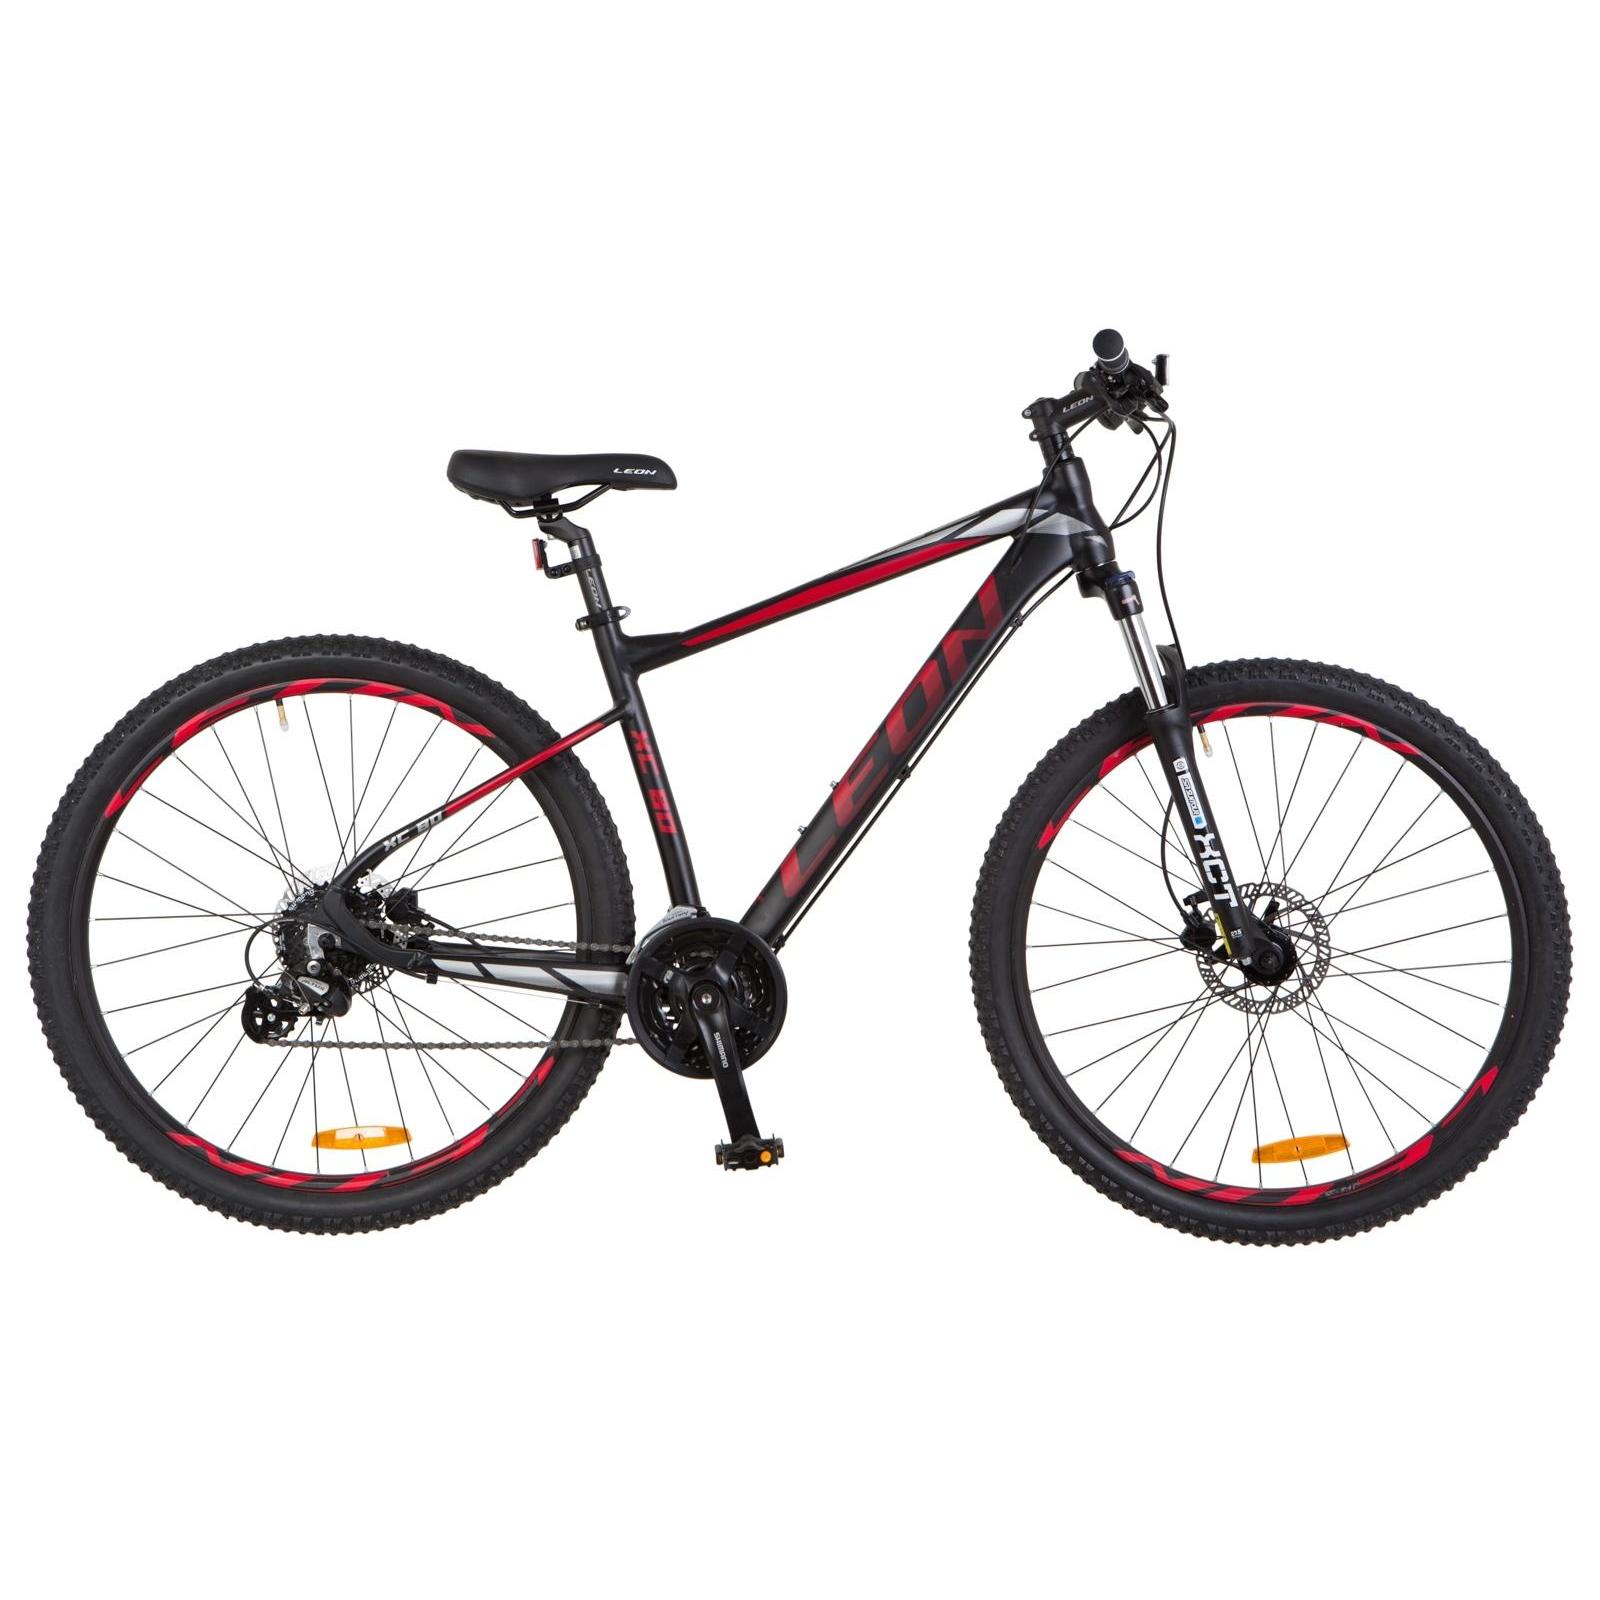 "Велосипед Leon 27.5"" XC-80 2018 AM Hydraulic lock out 14G HDD рама-20"" Al (OPS-LN-27.5-024)"